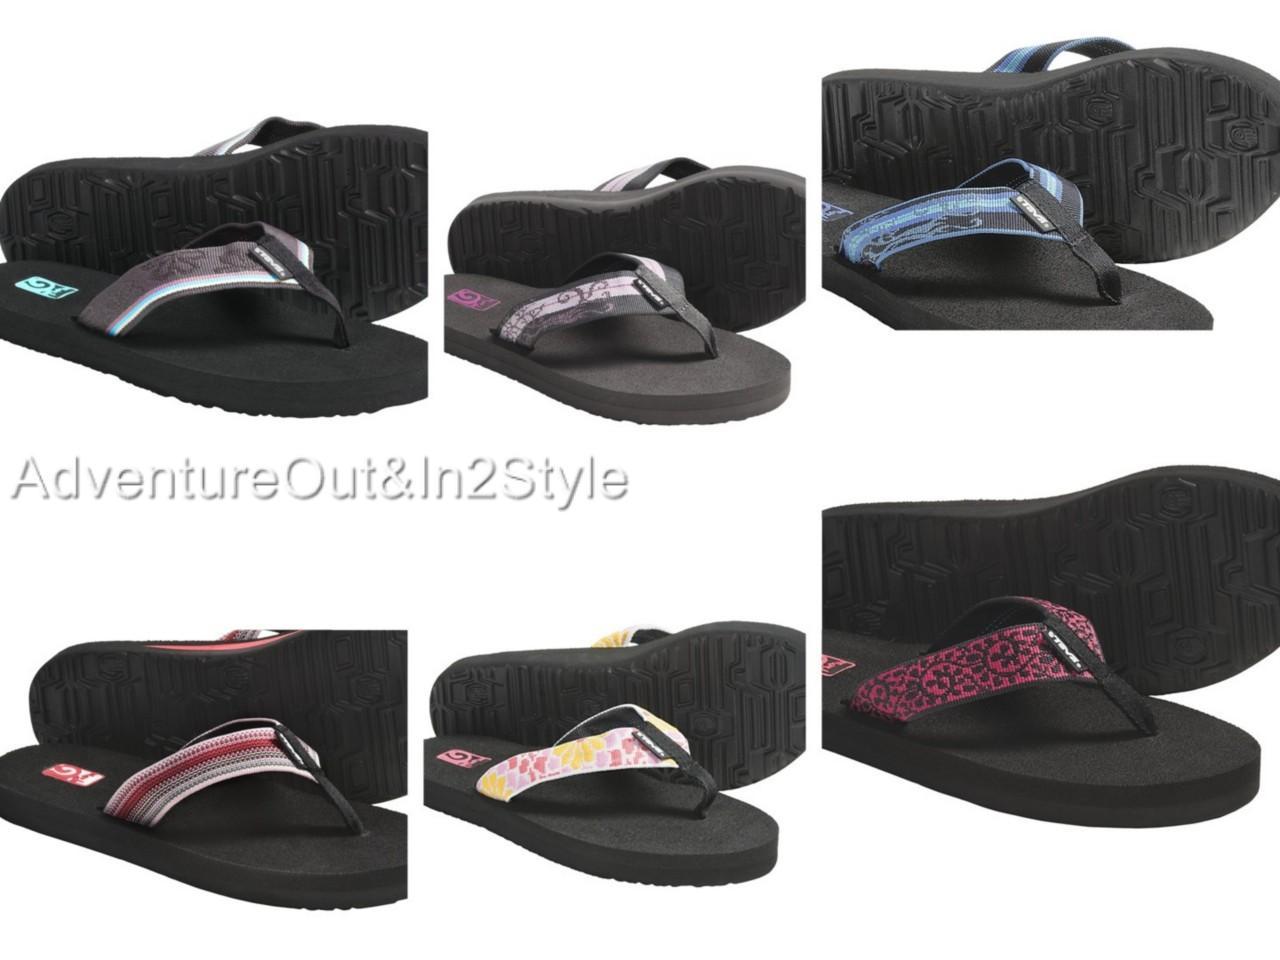 NEW-Teva-Mush-II-Sandals-Flip-Flop-Womens-VARIETY-SIZES-amp-COLORS-MSRP-25